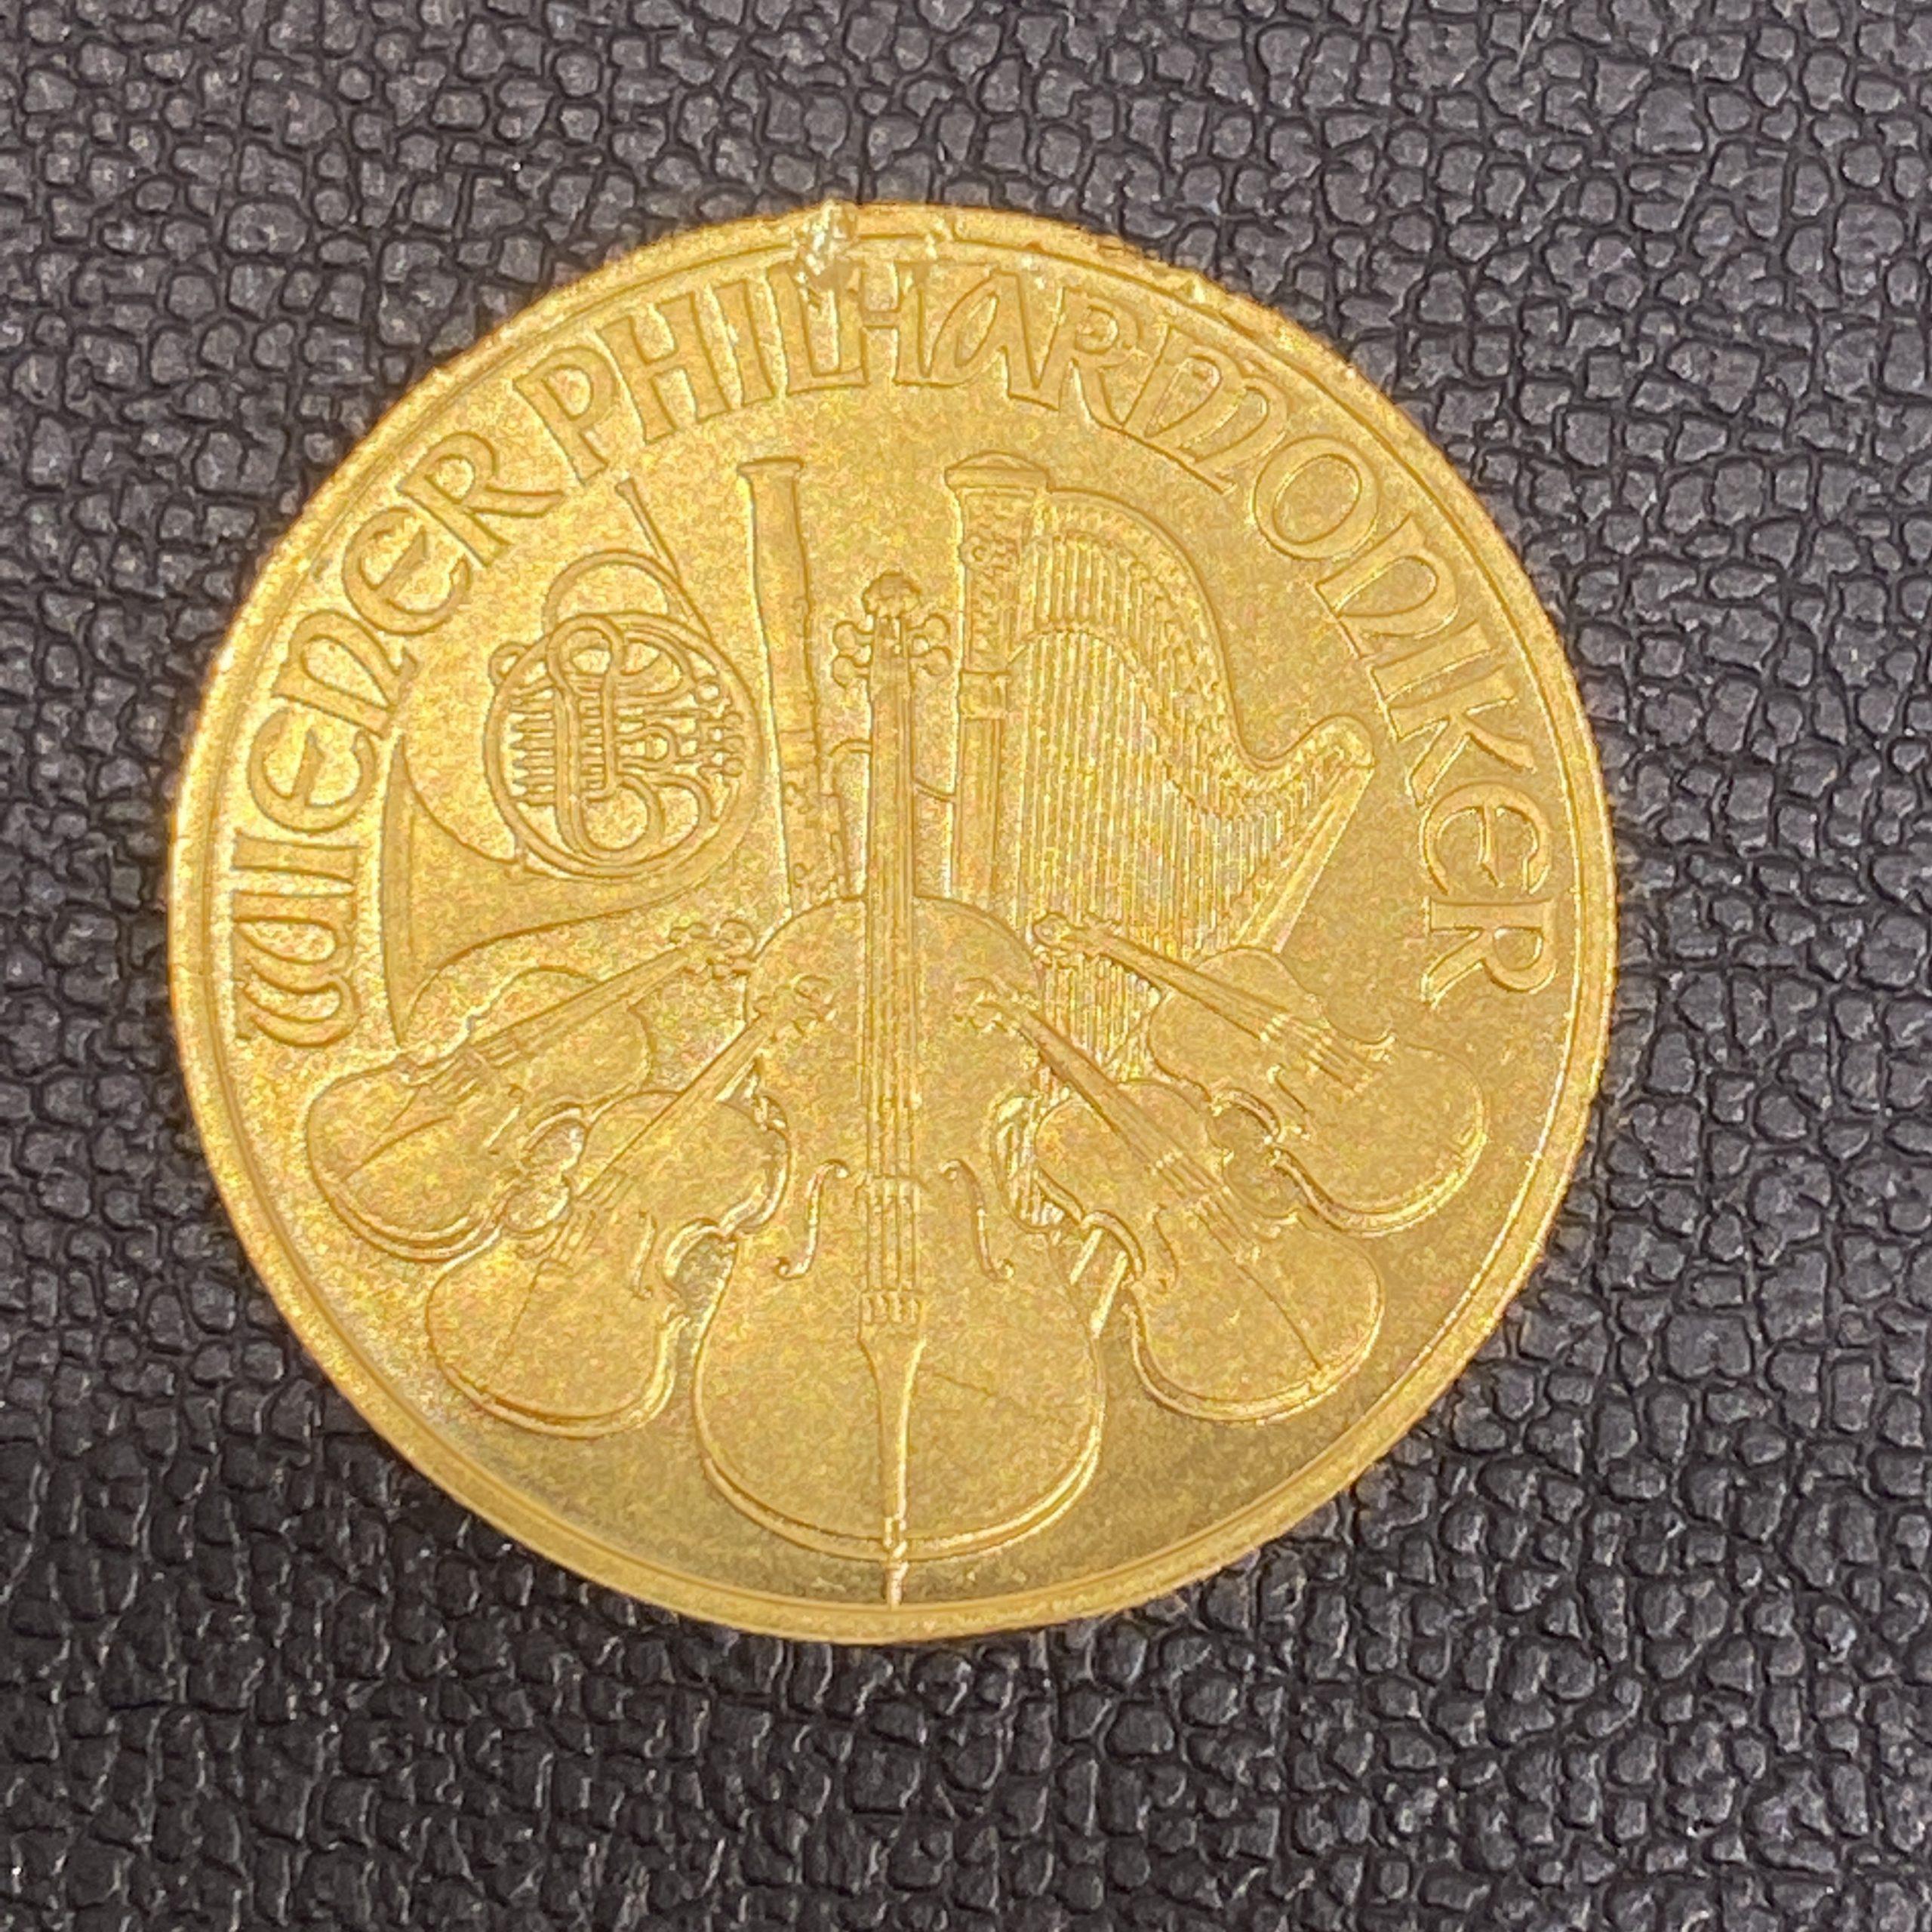 K24 ウィーン金貨 1/4OZ